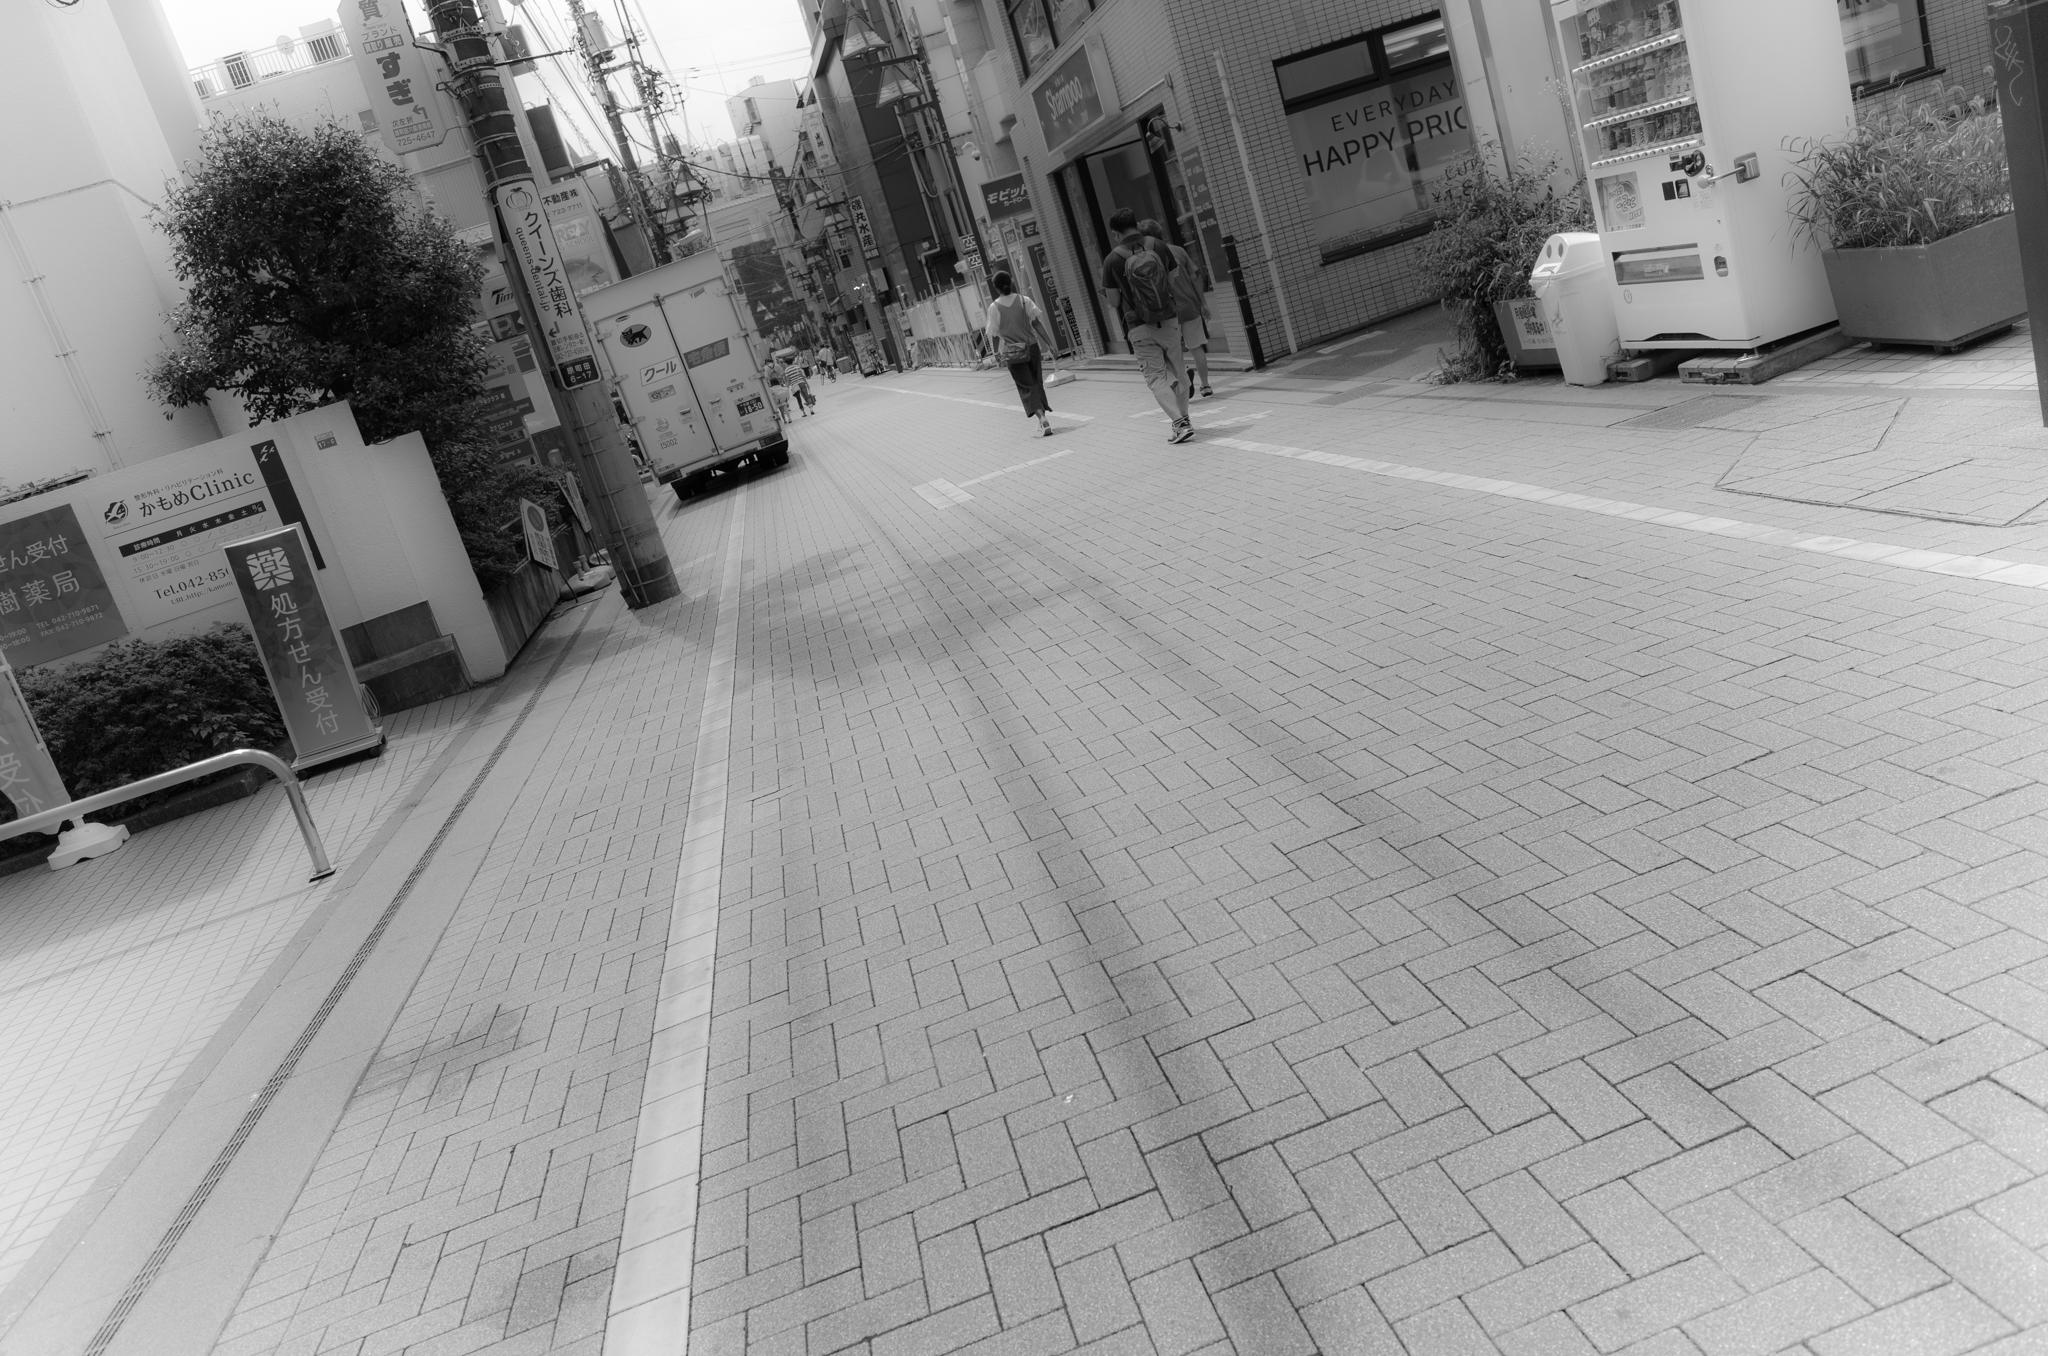 https://cdn-ak2.f.st-hatena.com/images/fotolife/s/sanchanG6V/20171123/20171123221853_original.jpg